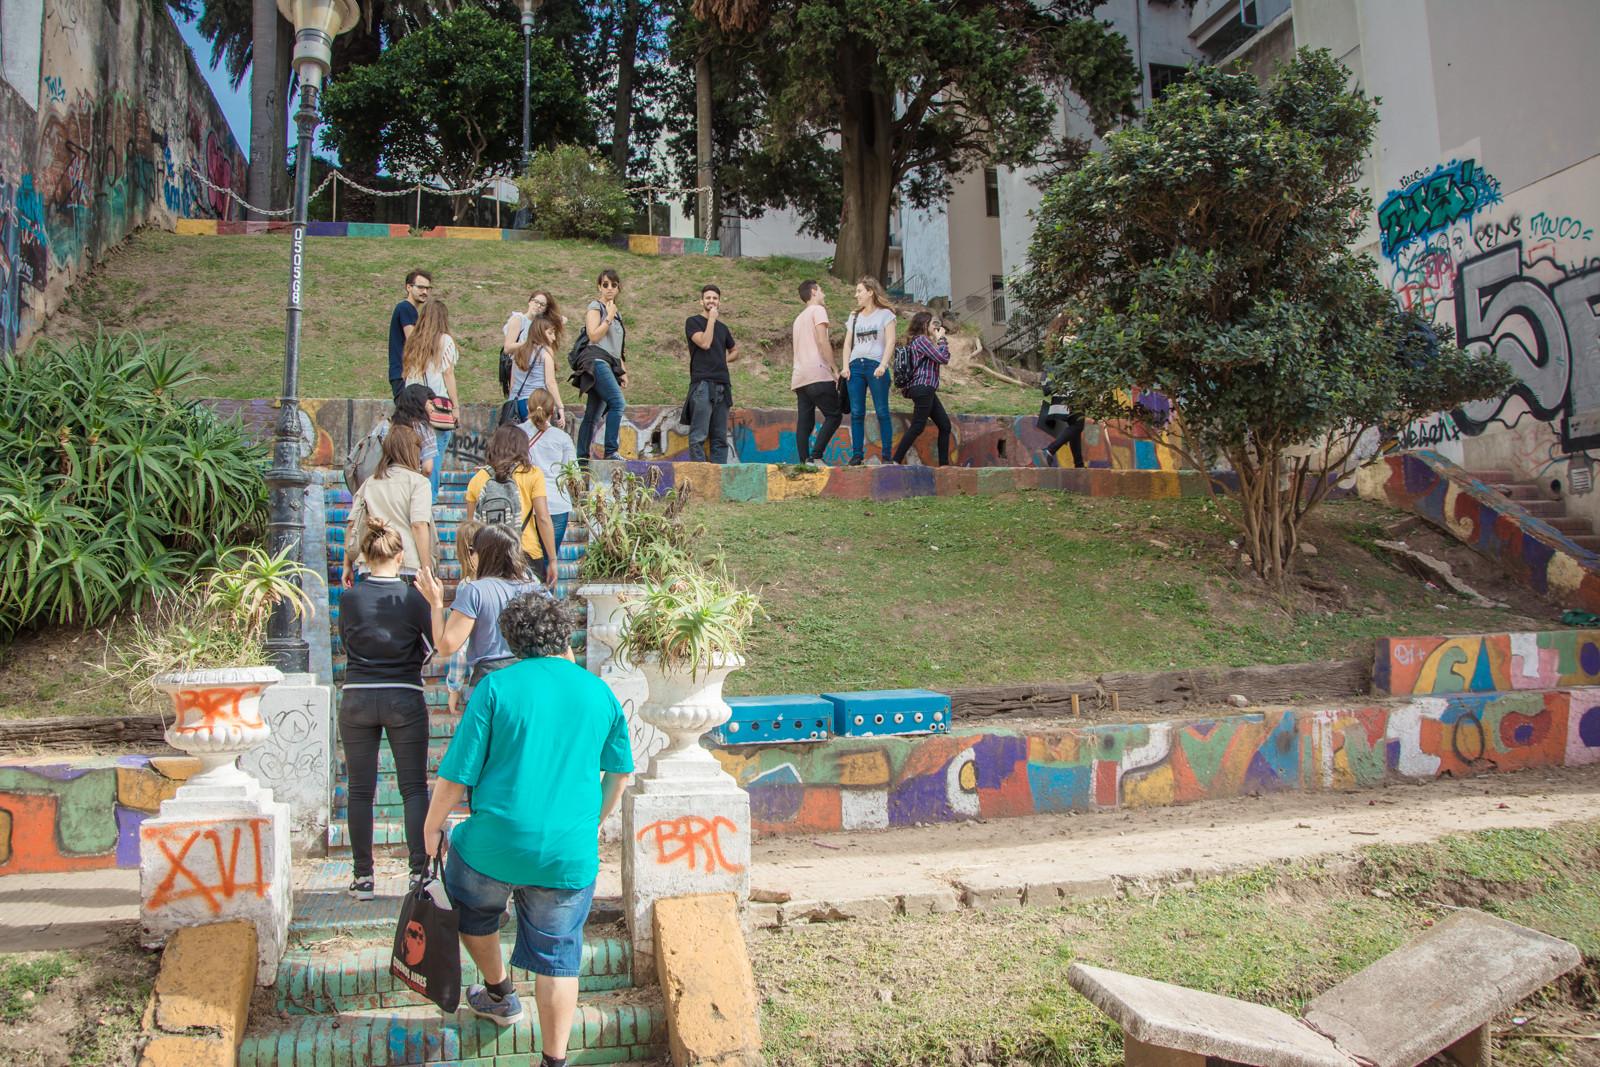 Jane's_Walk_Rosario_2017_DSC1116.jpg